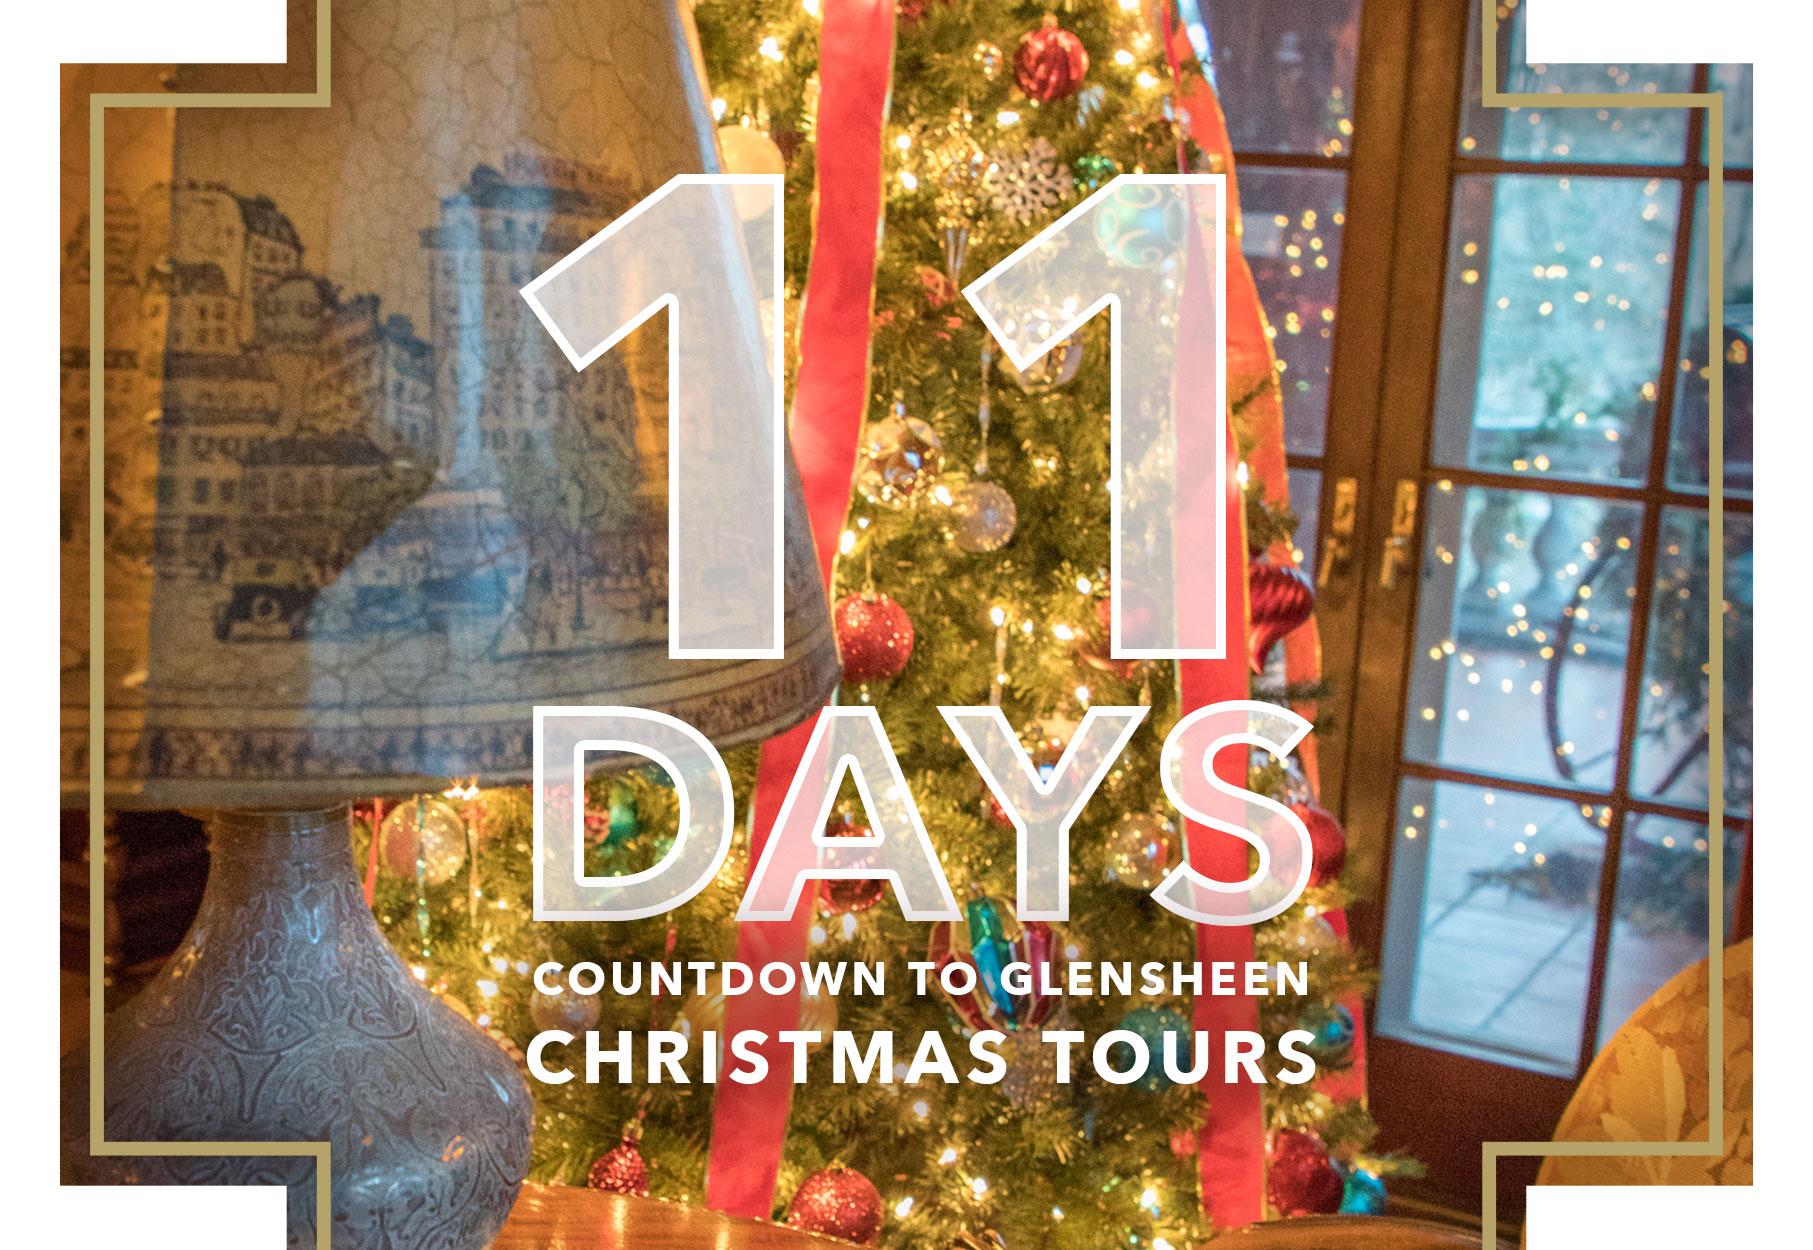 11 Days Until Christmas Tours